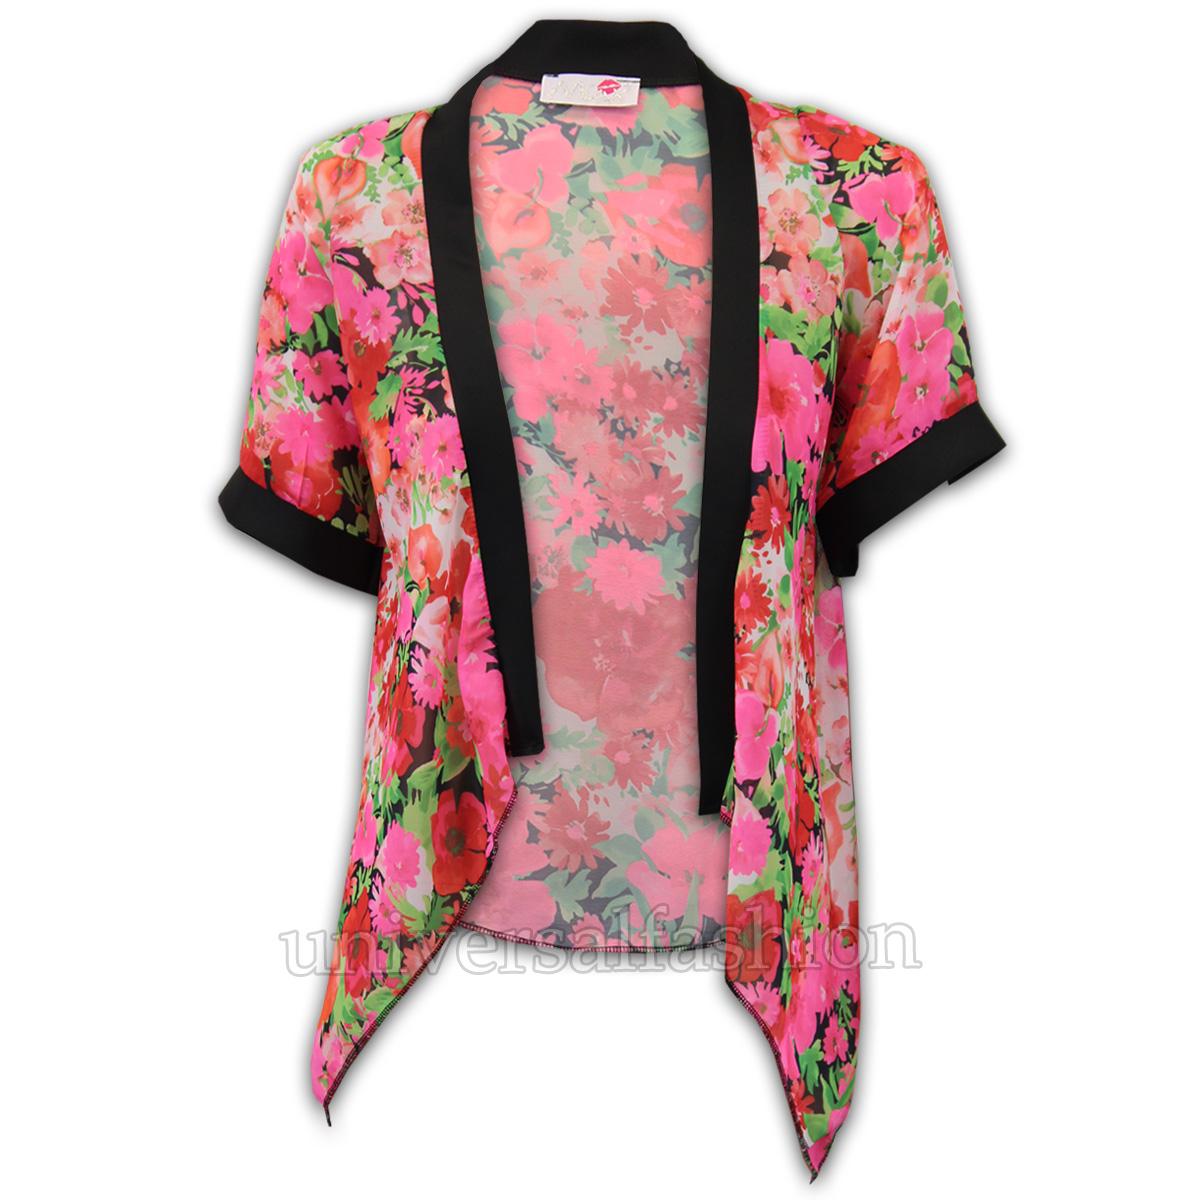 Ladies Cardigans Womens Kimono Chiffon Floral Top Loose ...